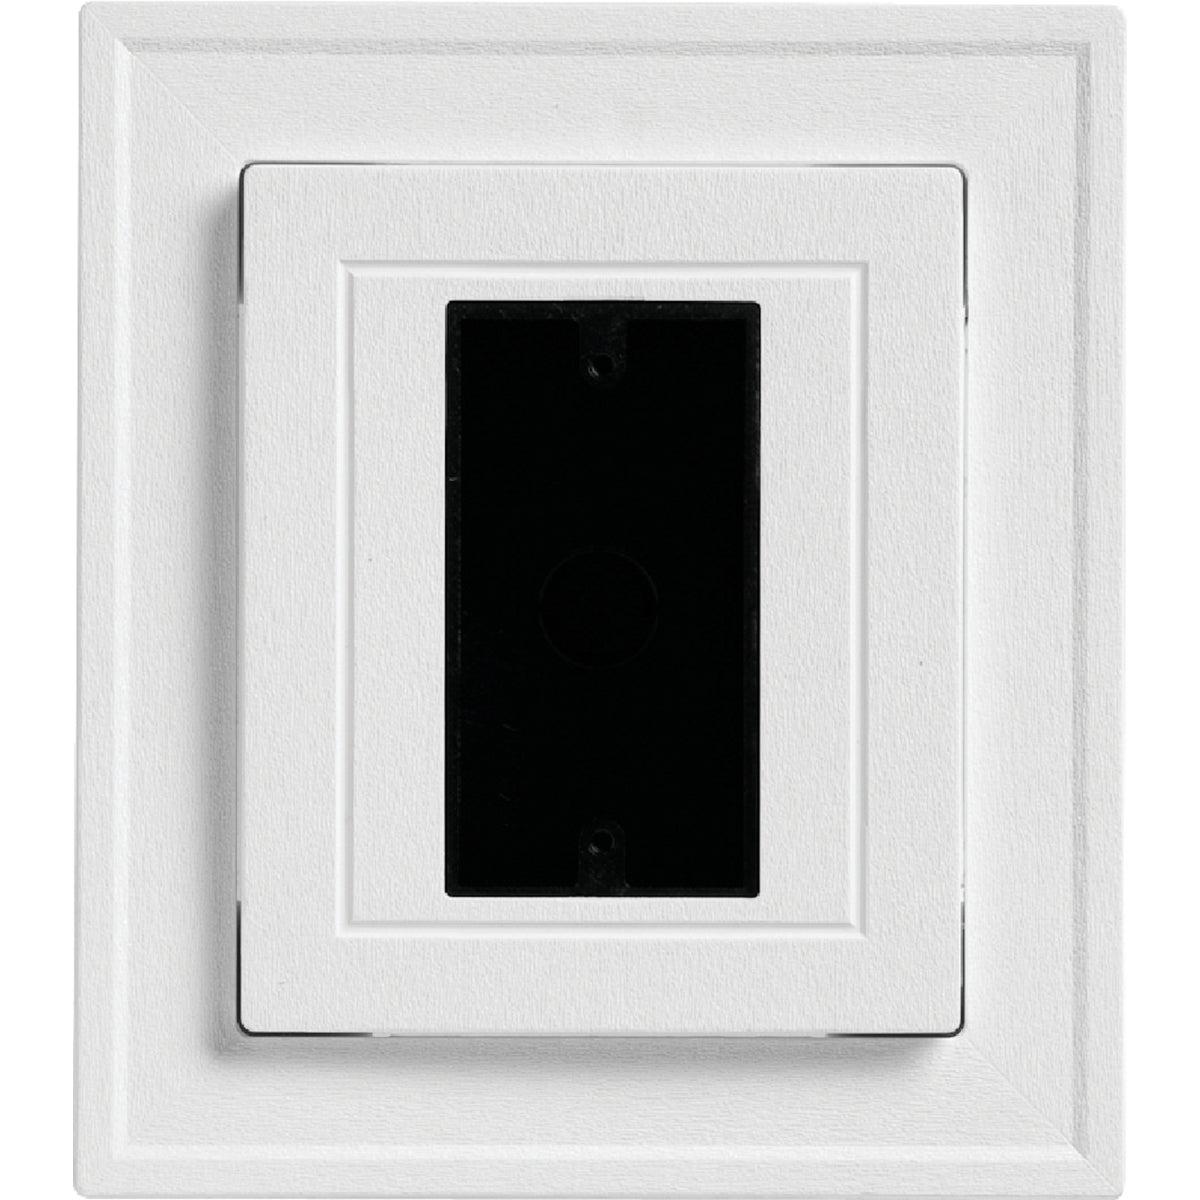 alcoa home exteriors: wht ul electrical block, eblock pw